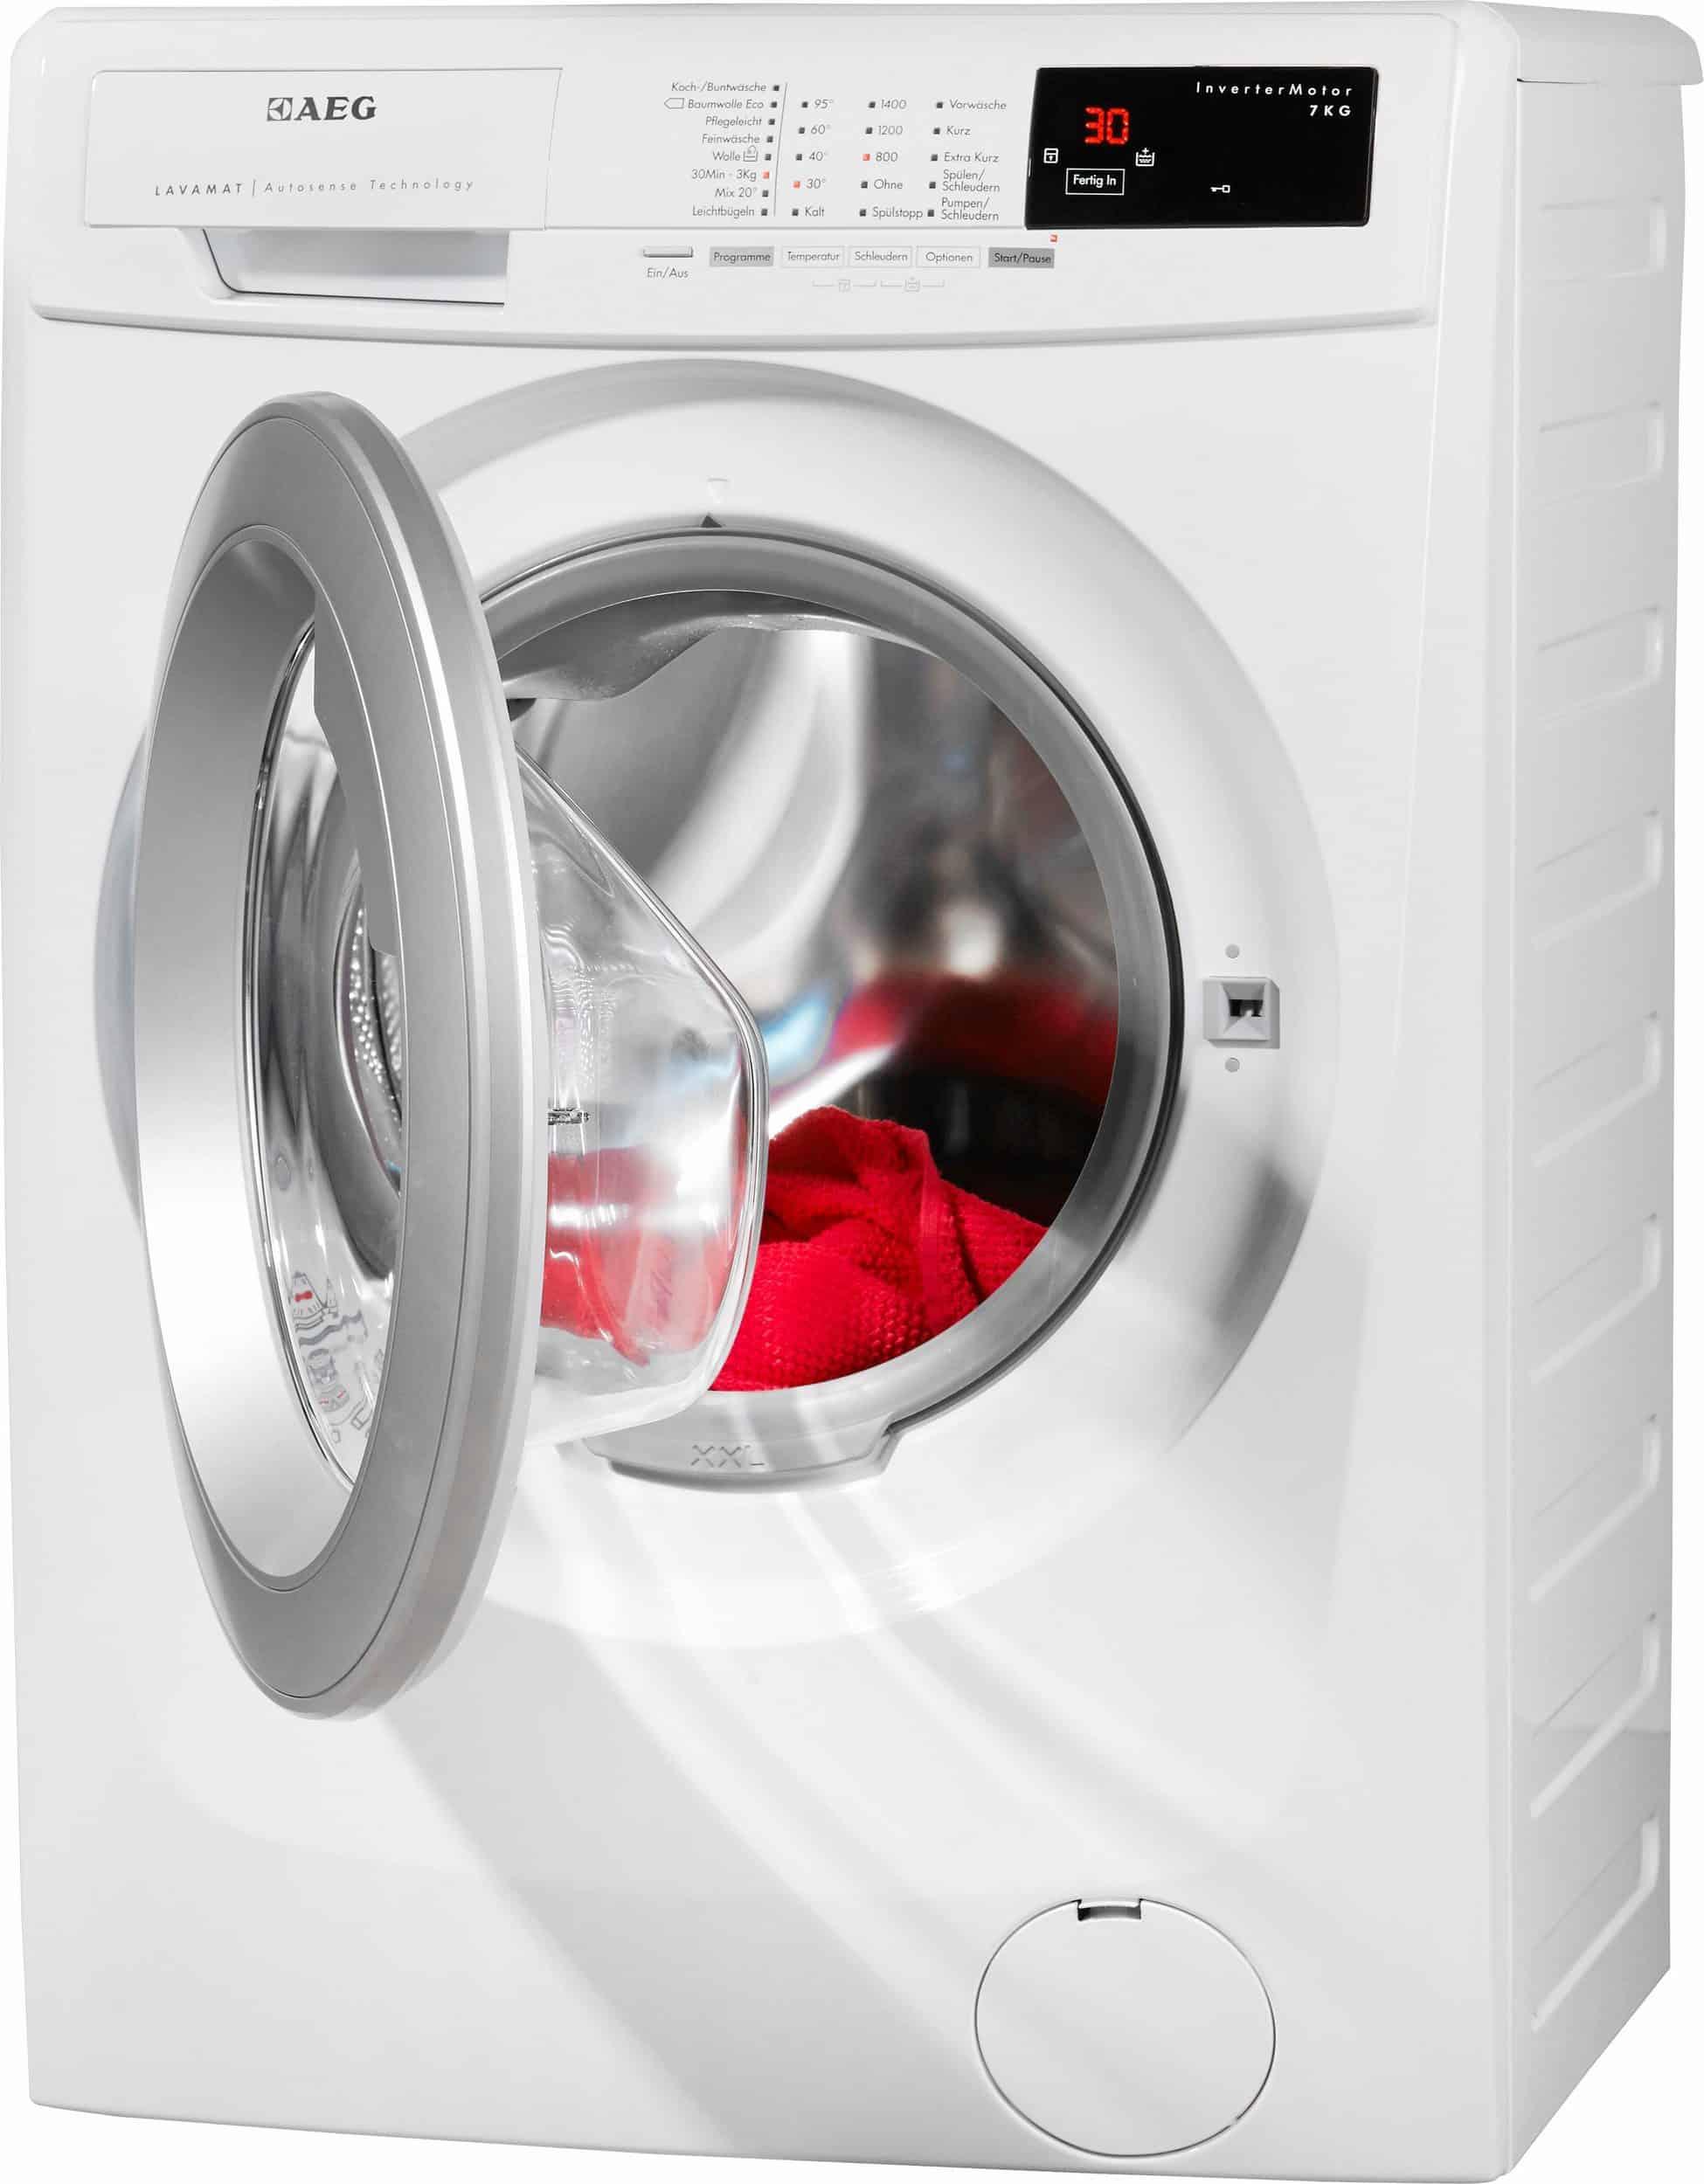 aeg lavamat l14as7 waschmaschine im test 2018. Black Bedroom Furniture Sets. Home Design Ideas